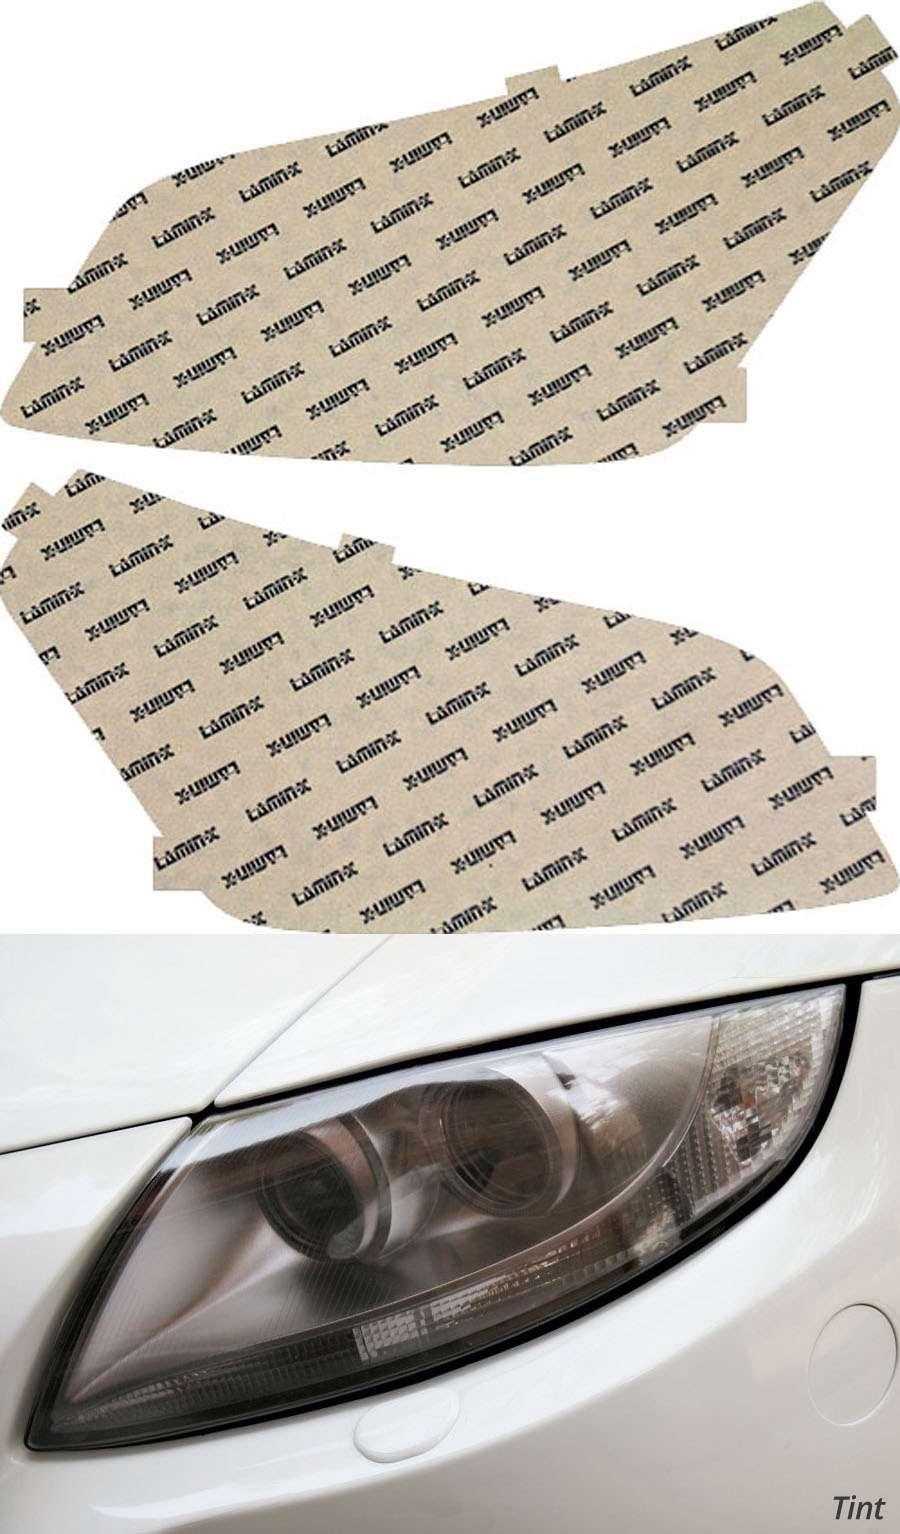 Pontiac Vibe 09-10 Tint Headlight Covers Lamin-X PT008T